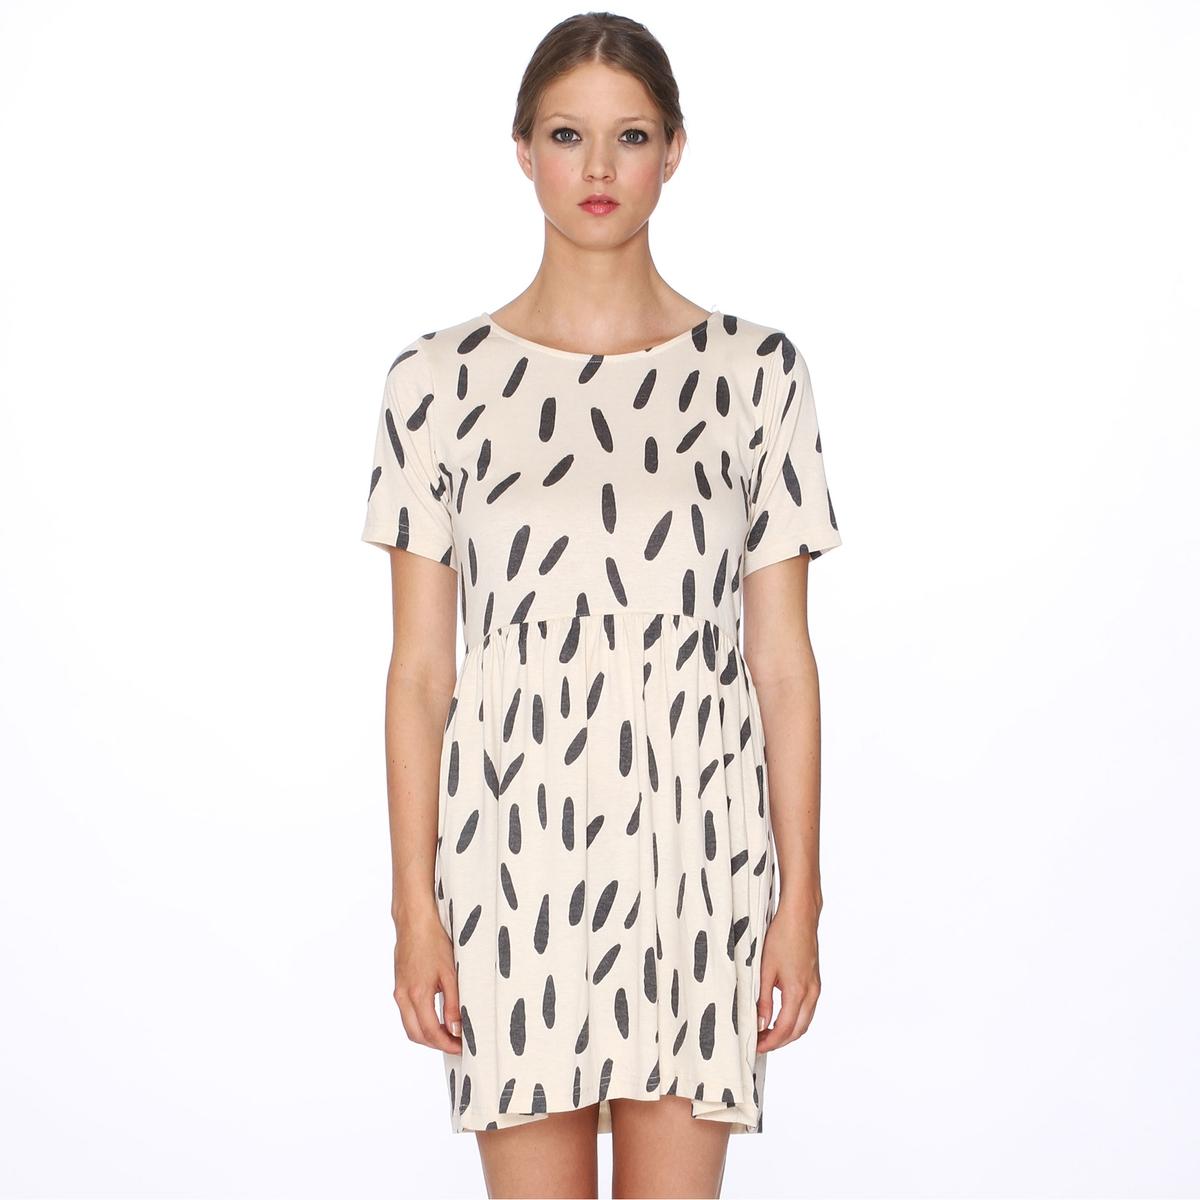 Платье с короткими рукавами, с рисунком PEPALOVES, Dress Black Rice платье с короткими рукавами с рисунком